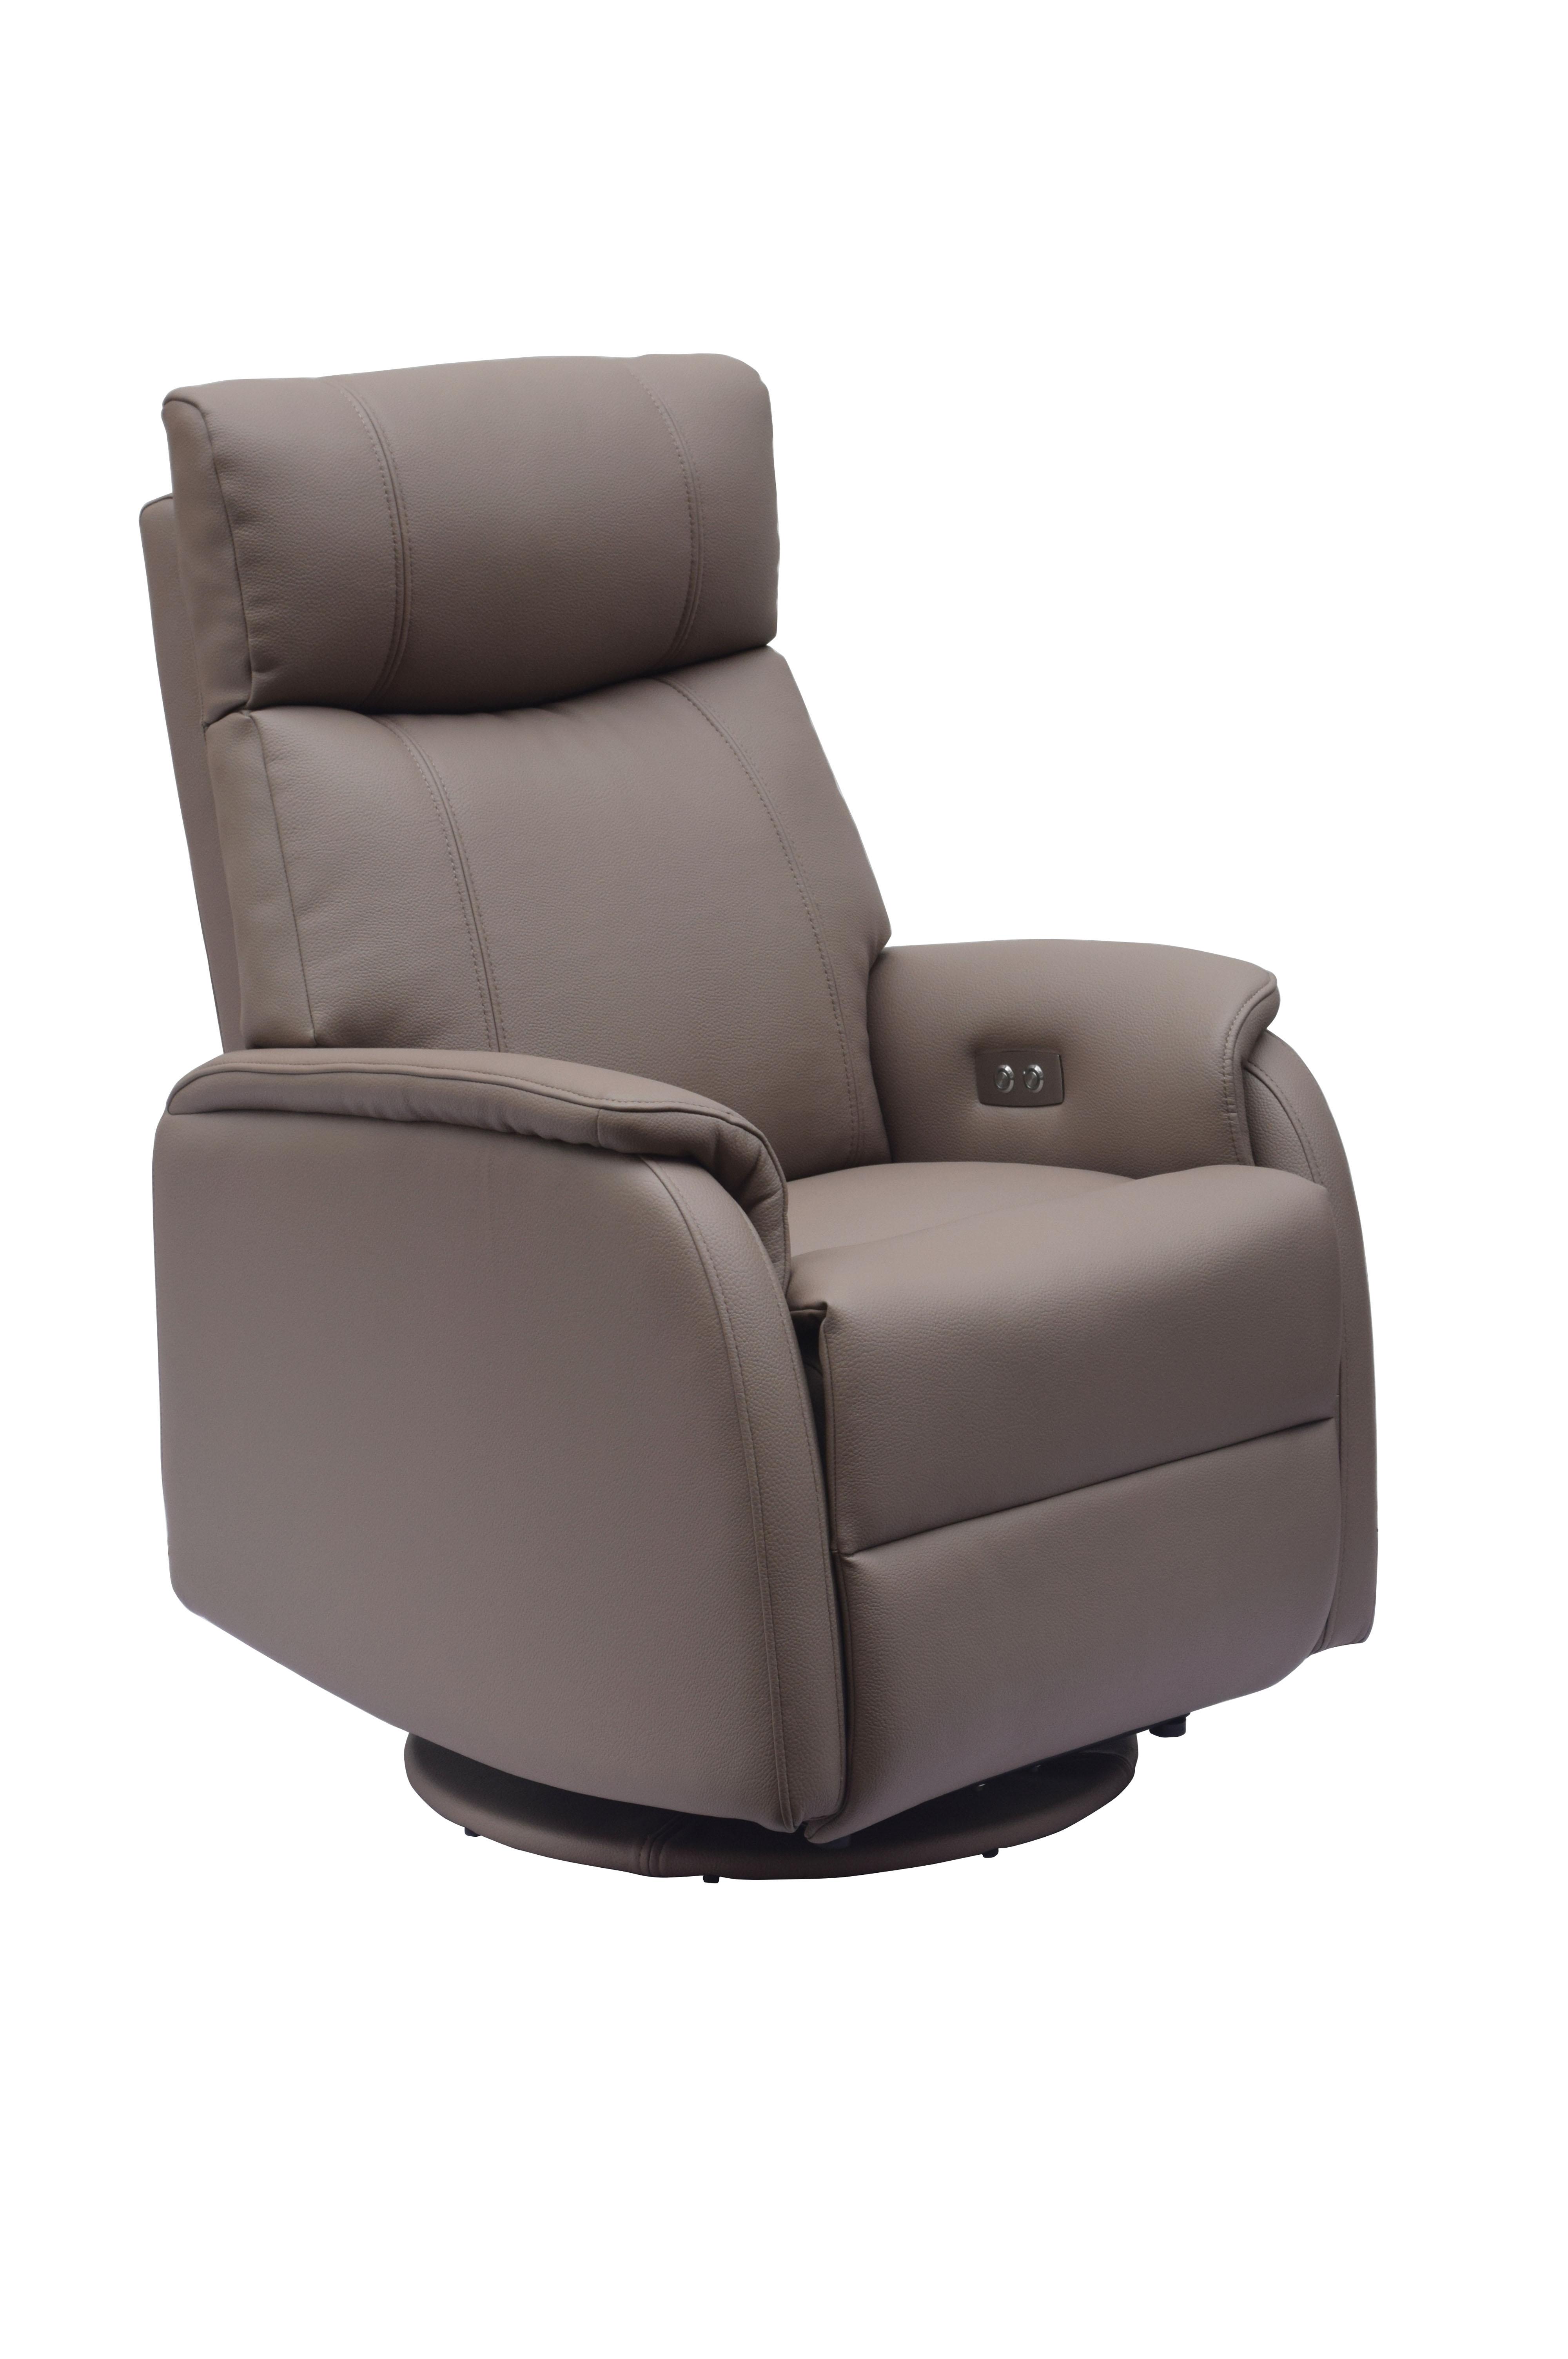 Gfa Positano Electric Swivel Leather Recliner Chair Earth